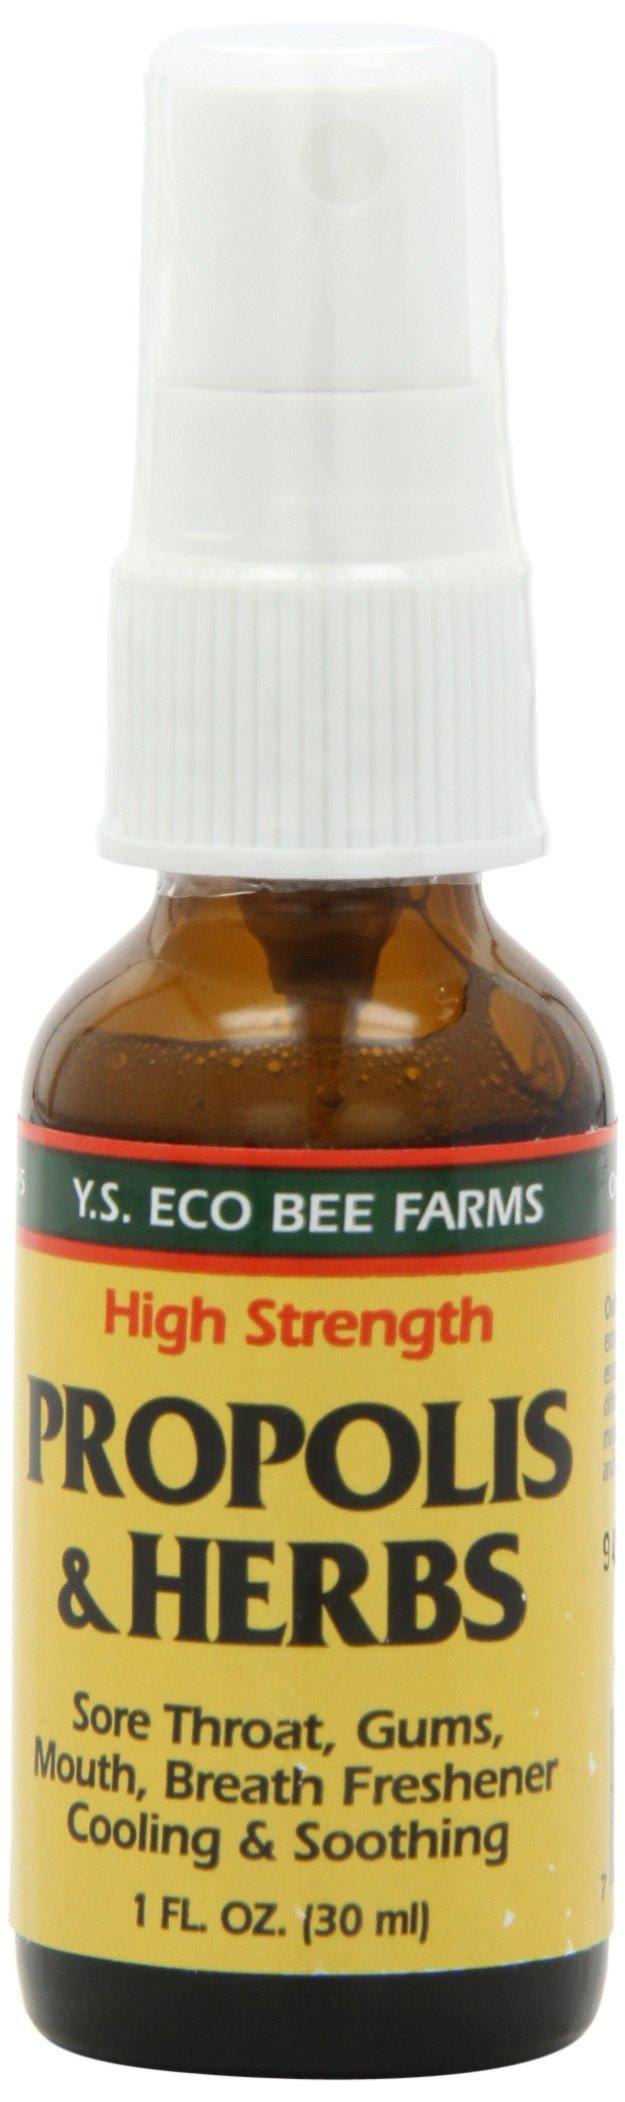 Propolis & Herbs Throat Spray YS Eco Bee Farms 1 oz Spray